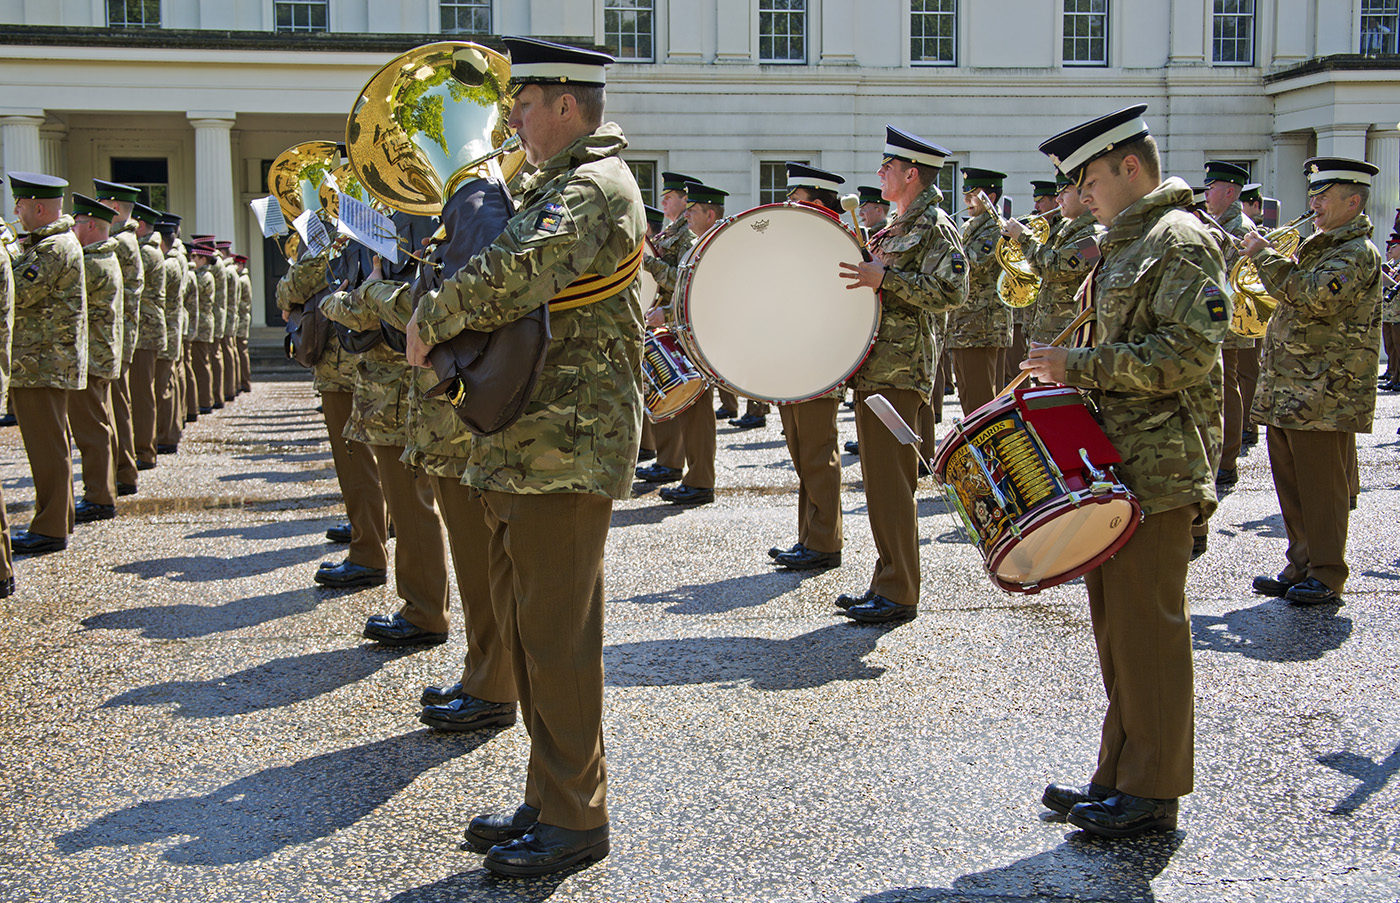 At Wellington Barracks